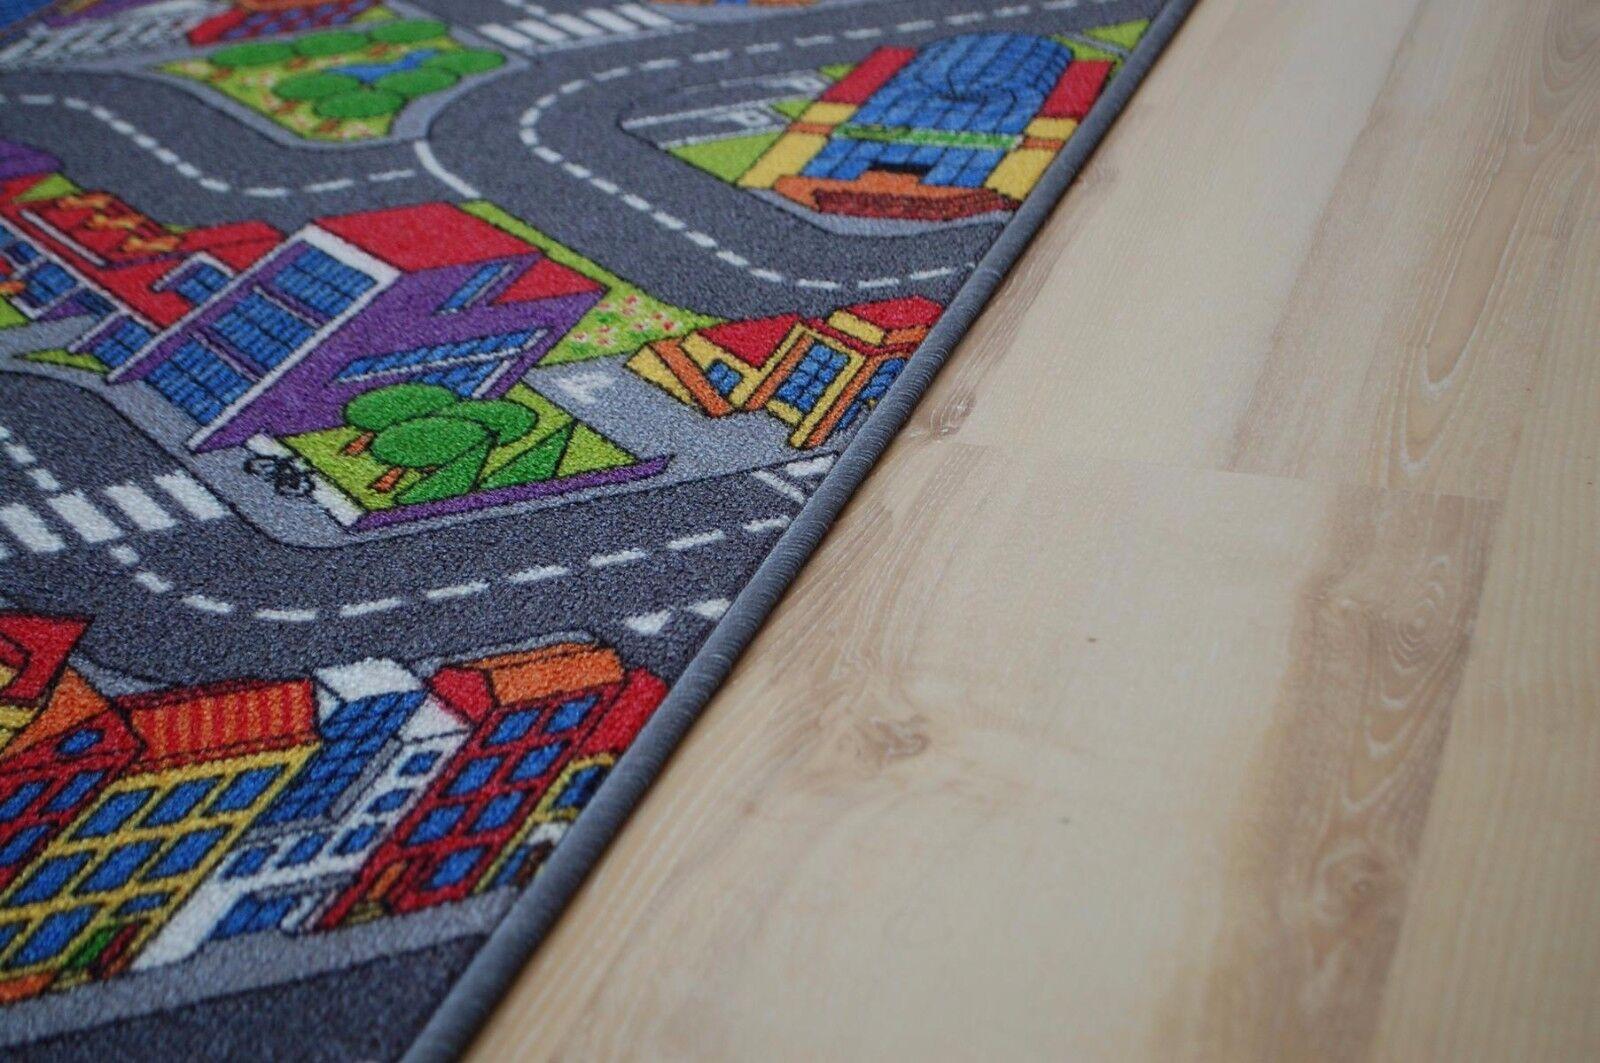 Tappeto stradale stradale stradale BAMBINI GIOCO Citylight 200x380 cm bc17a0